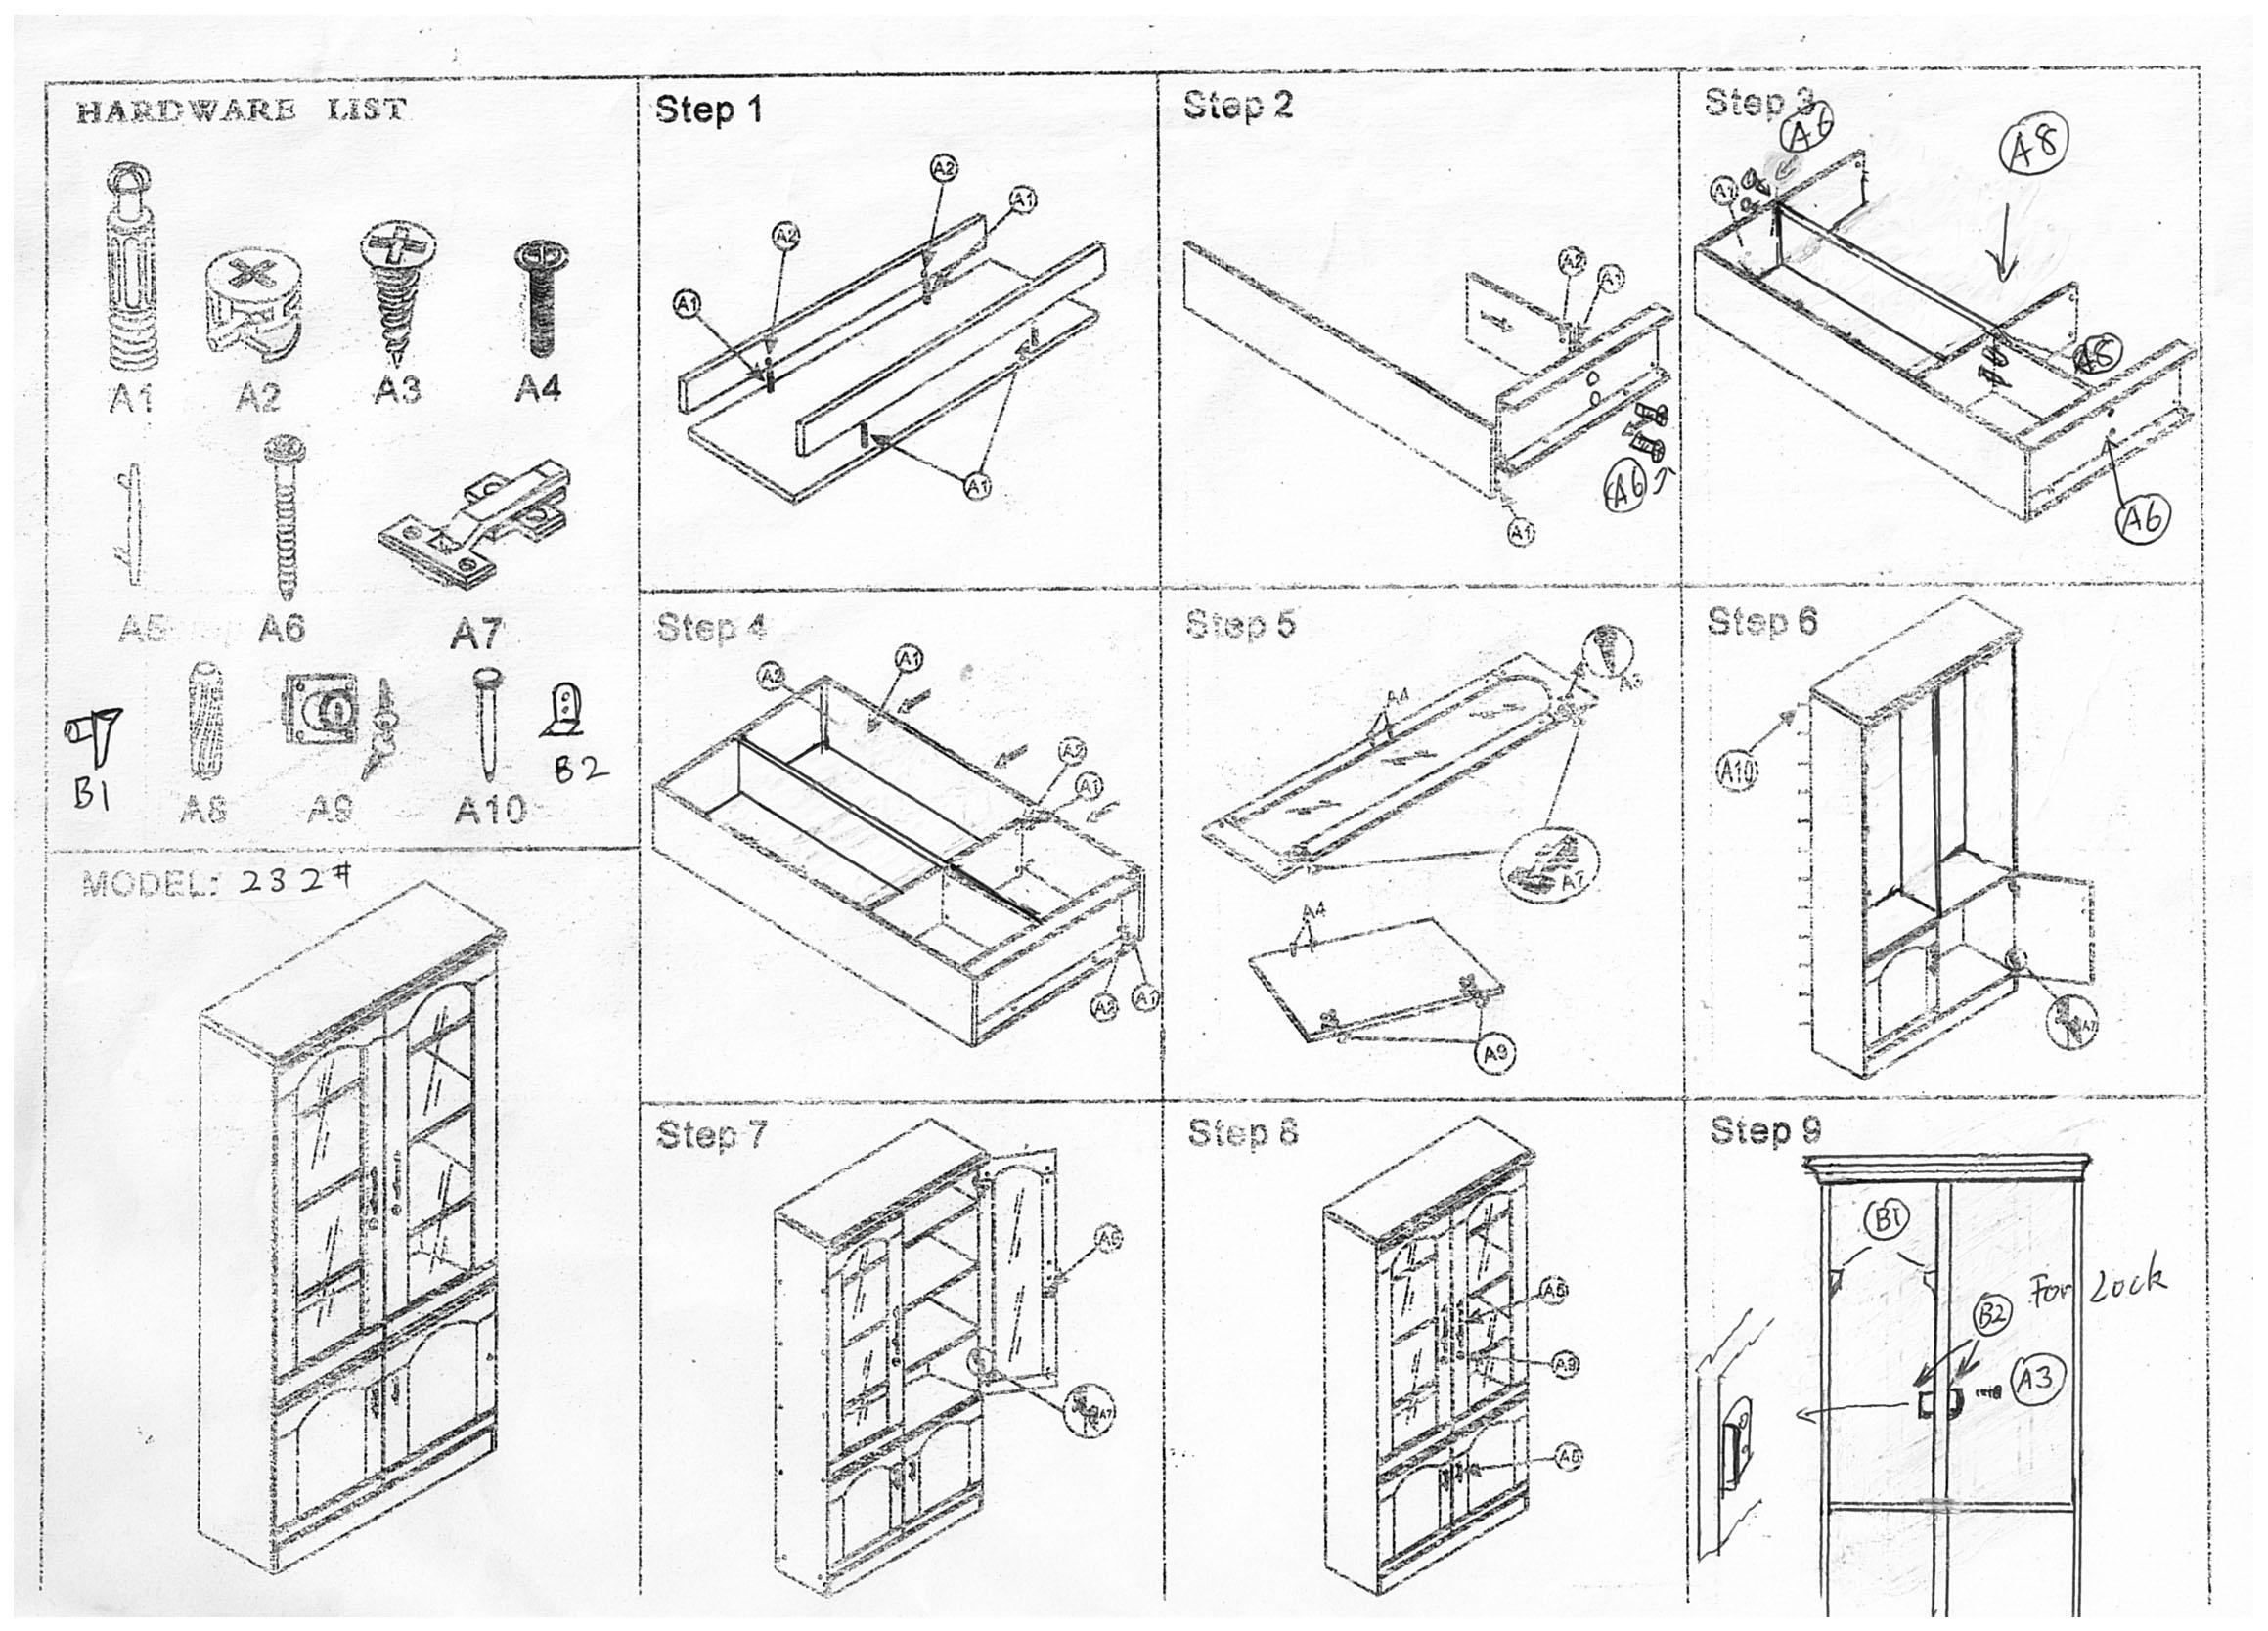 installation diagram uff1a office furniture melbourne